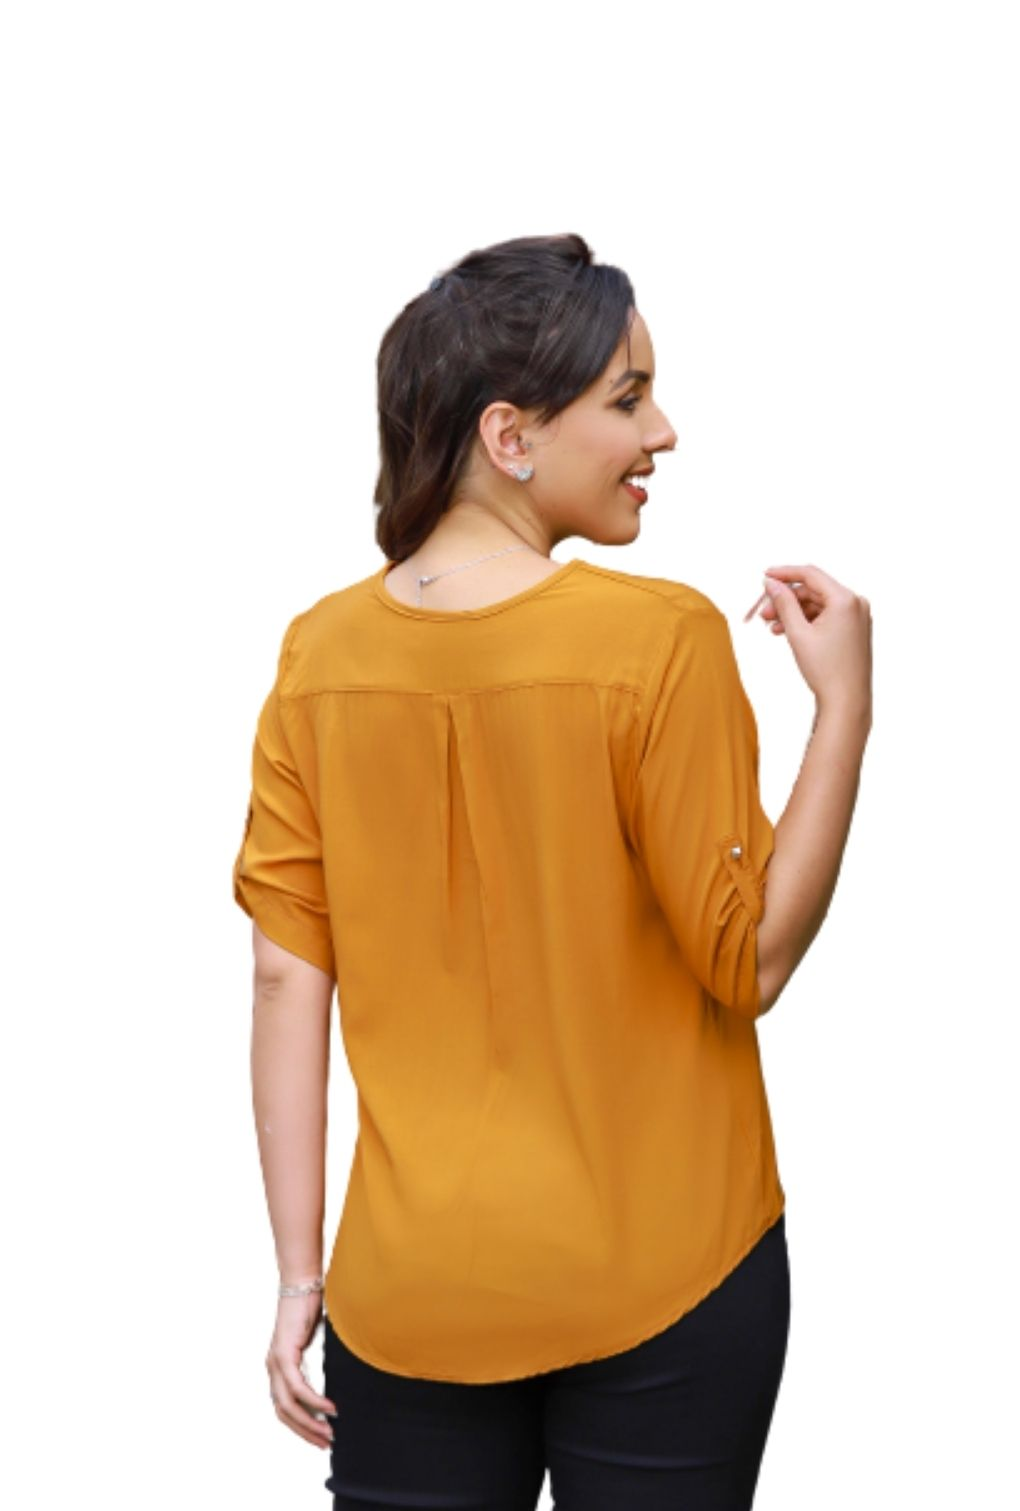 Camisa Blusa Feminina Manga Curta Social Lisa Mostarda  - ModaStore | Moda Feminina